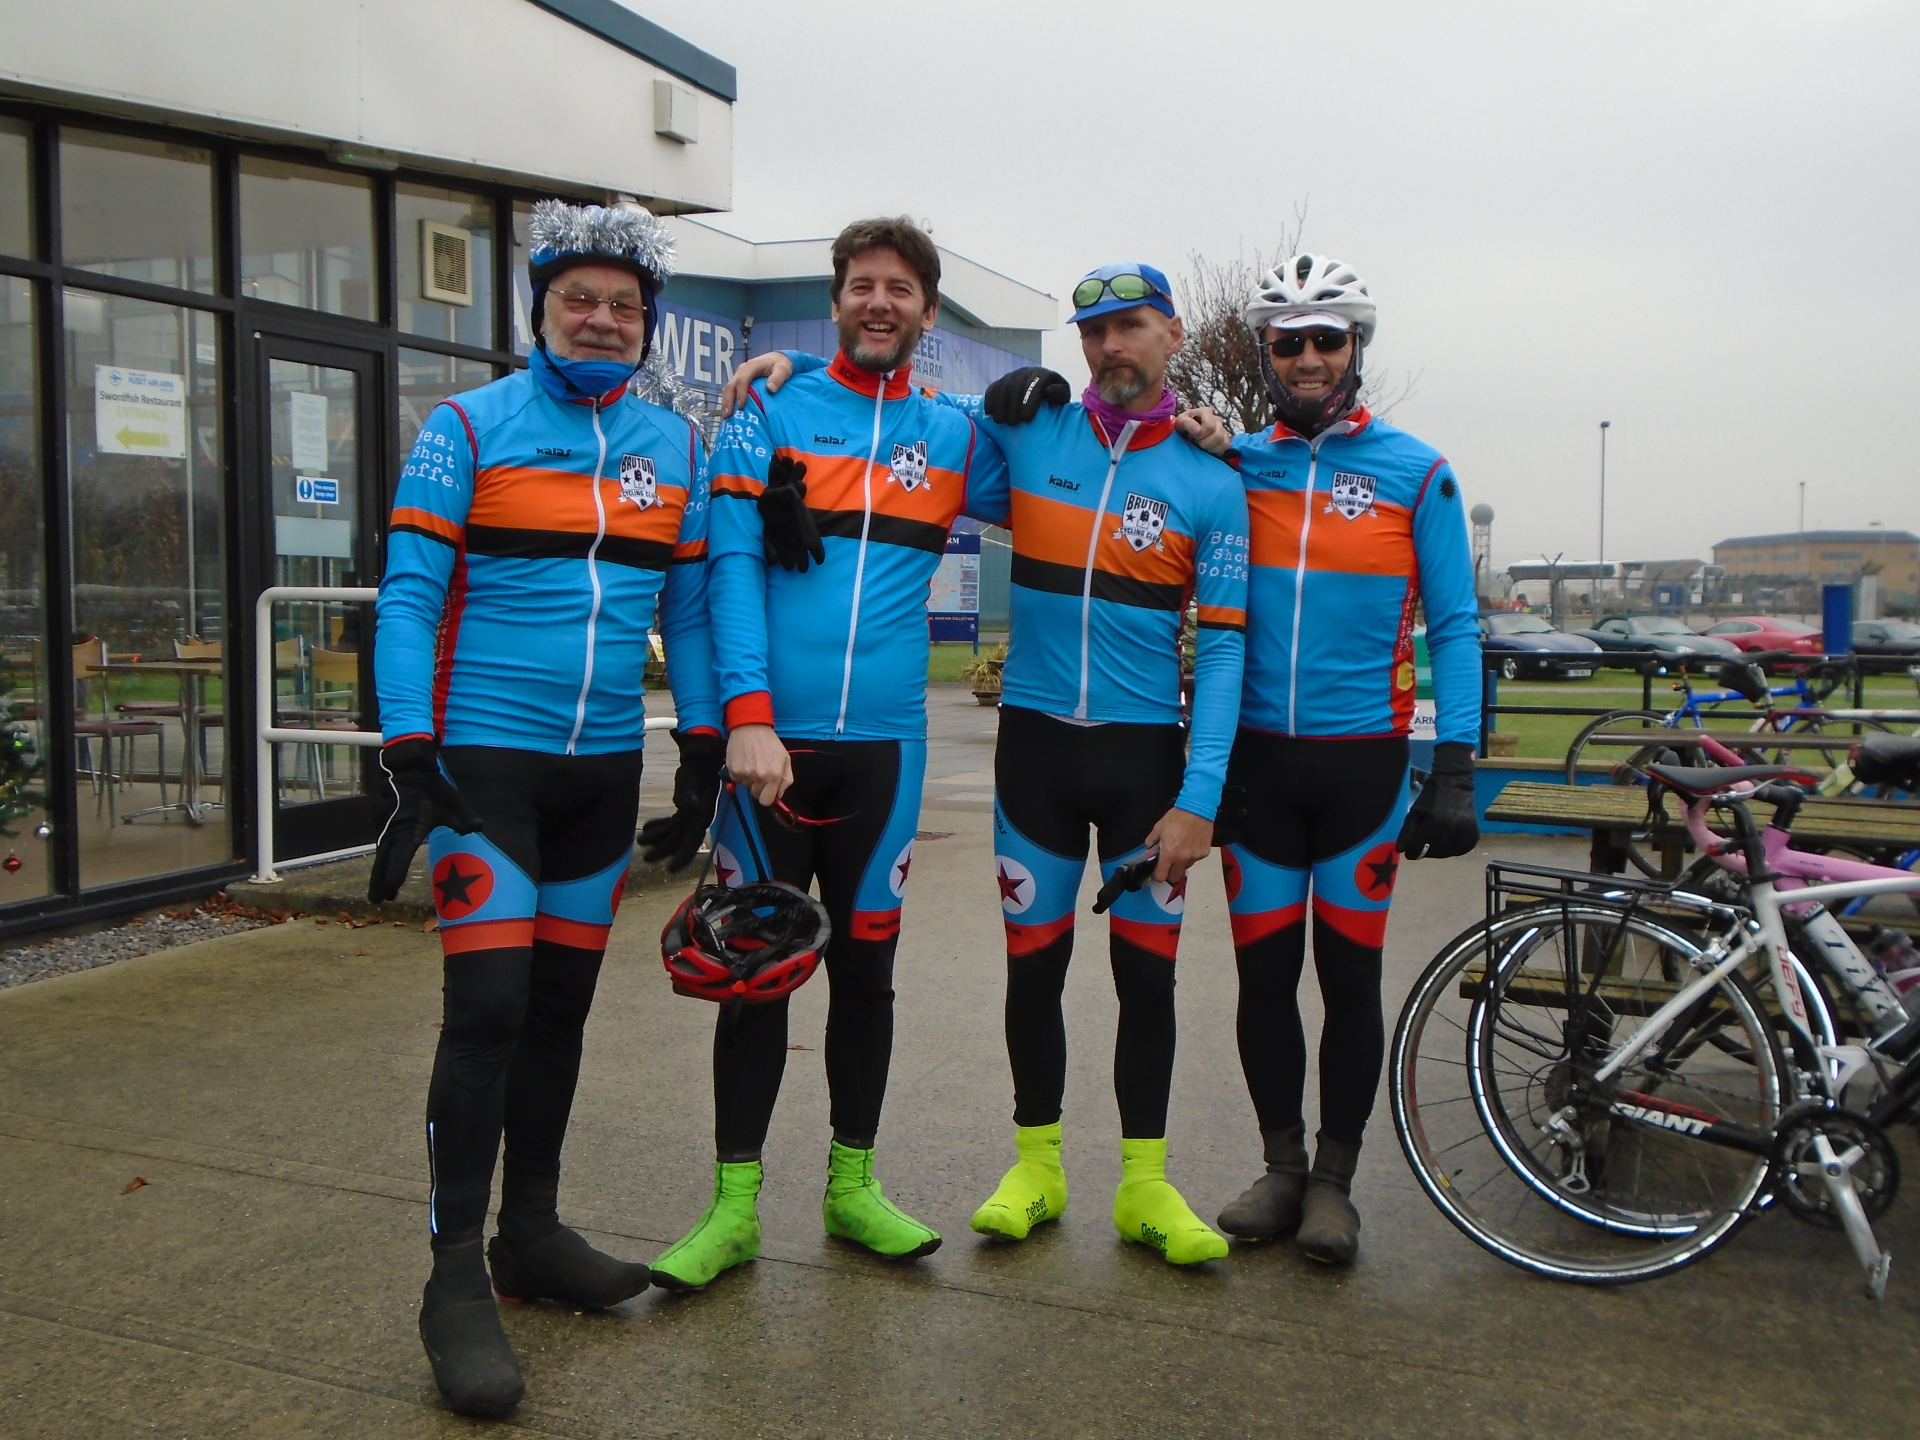 Presidential Ride to Yeovilton